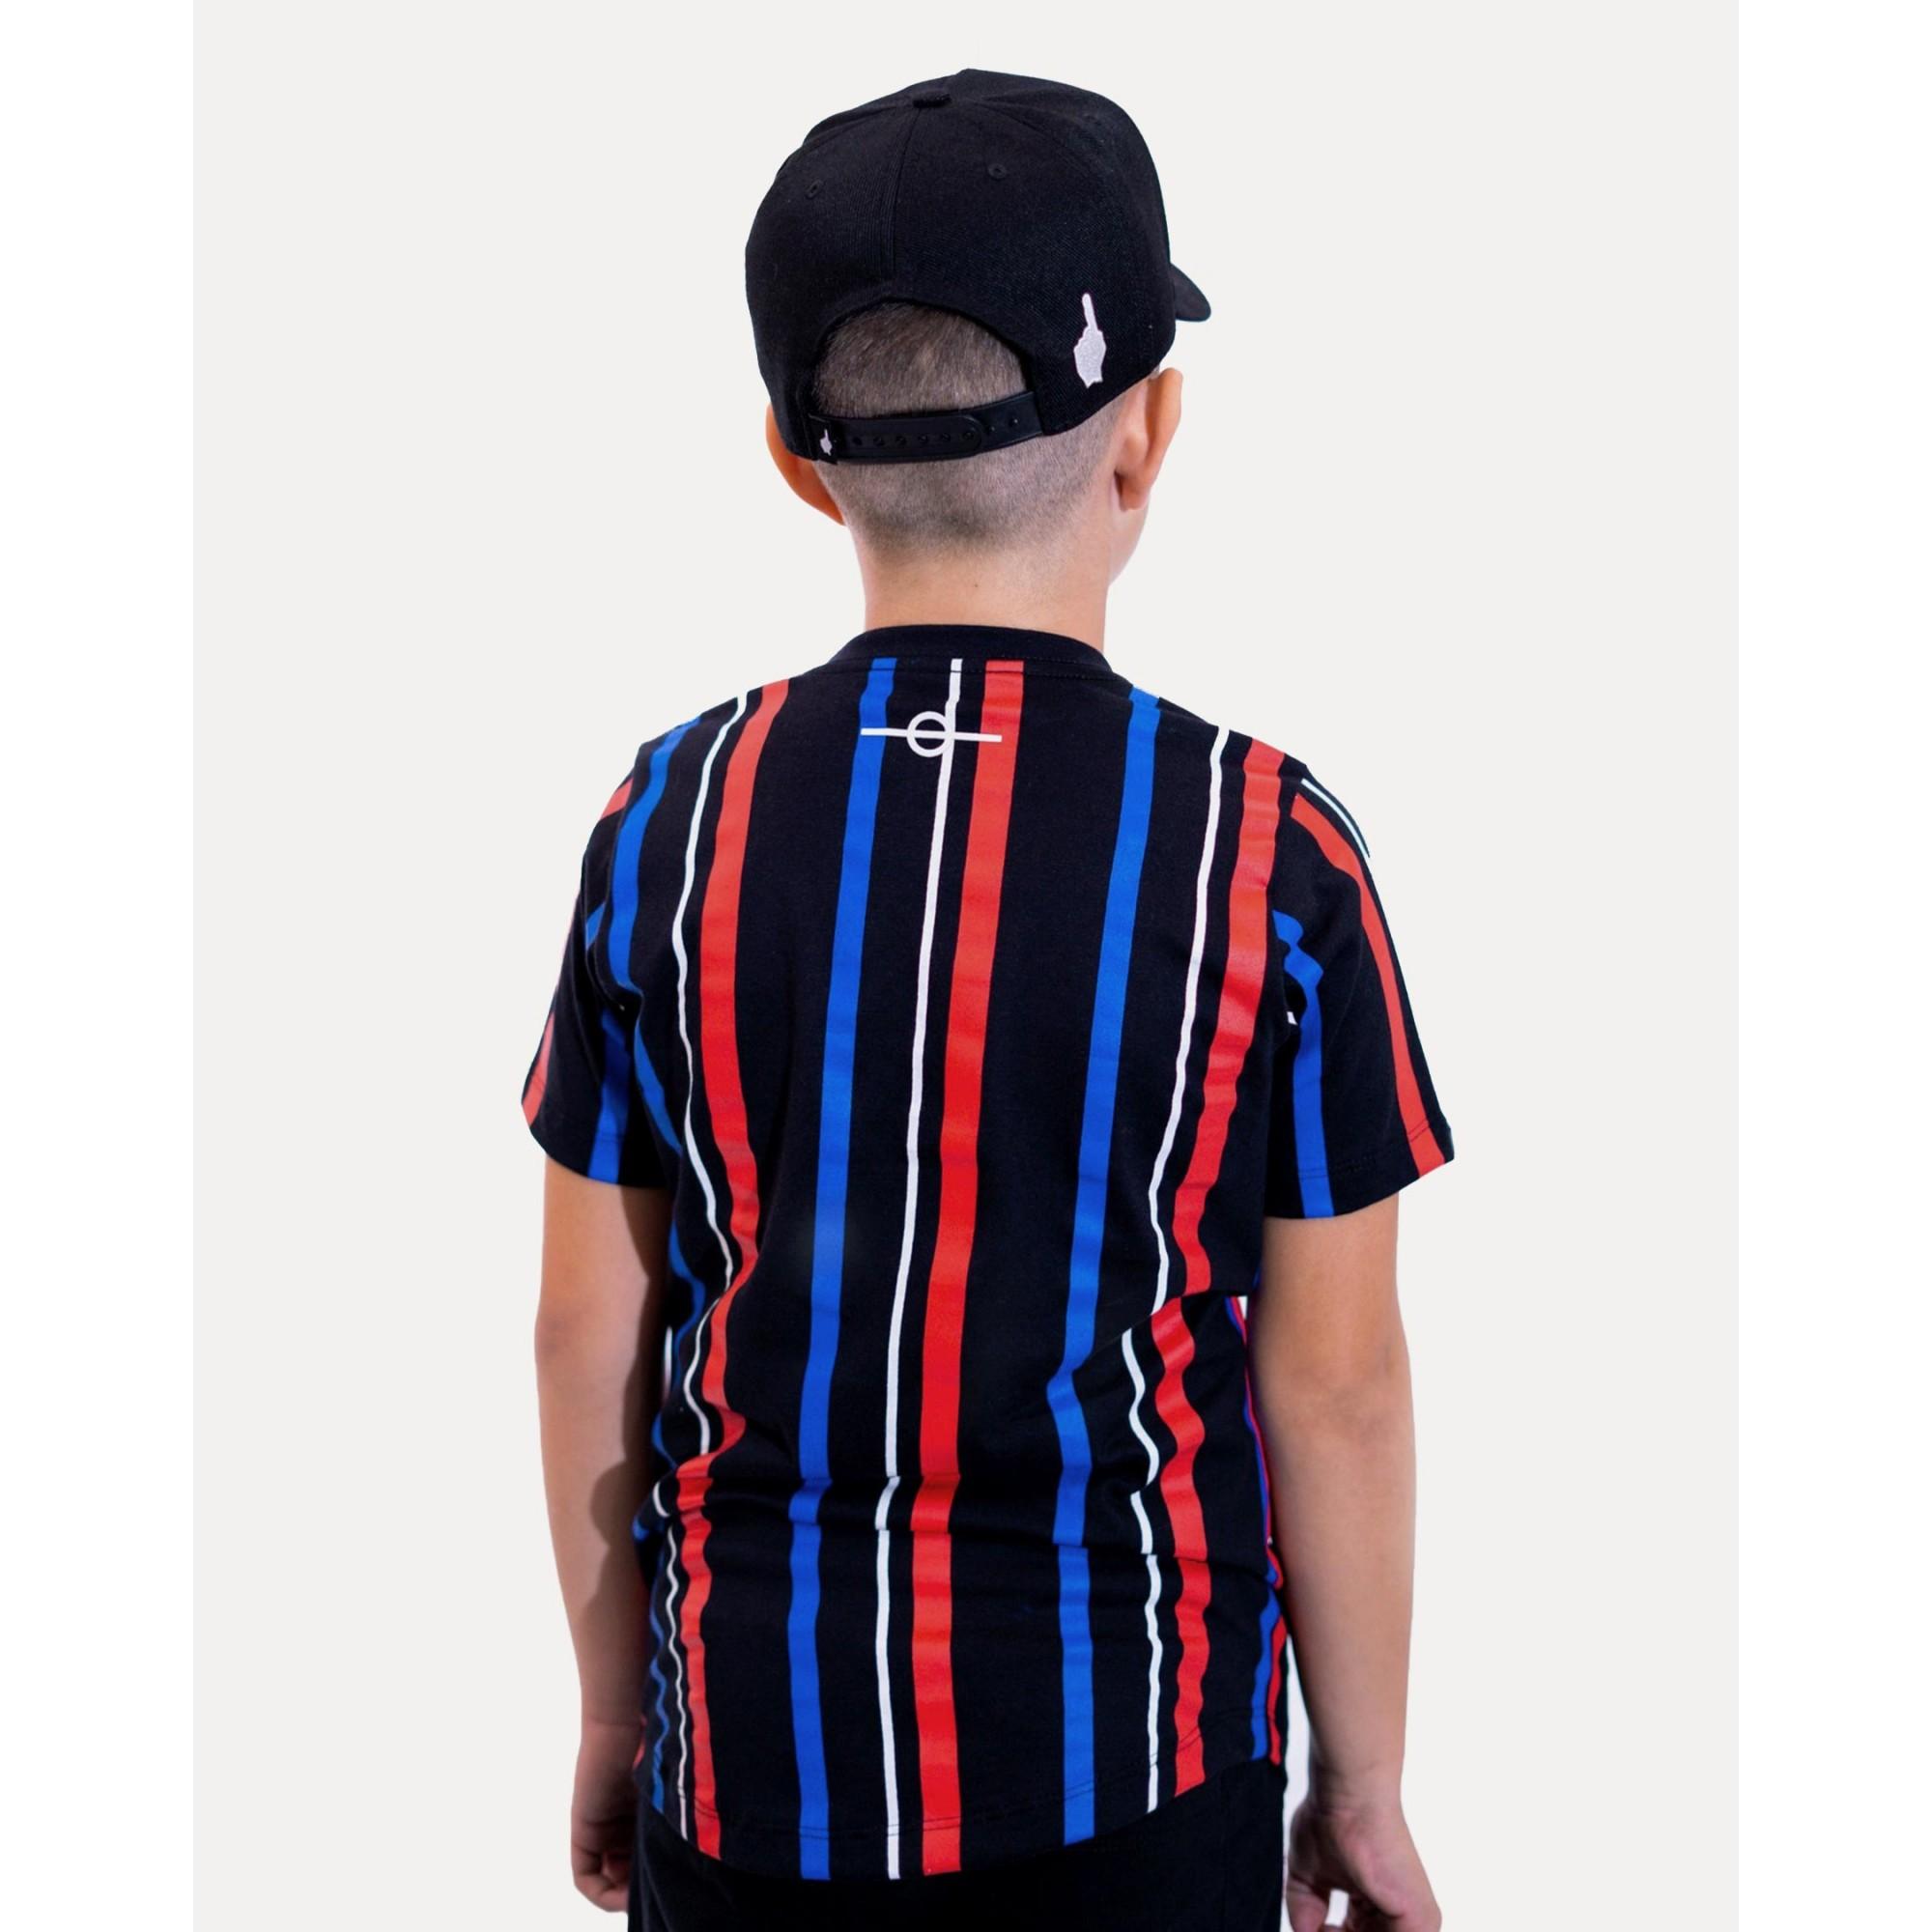 Camiseta Buh Kids Stripes HQ Black